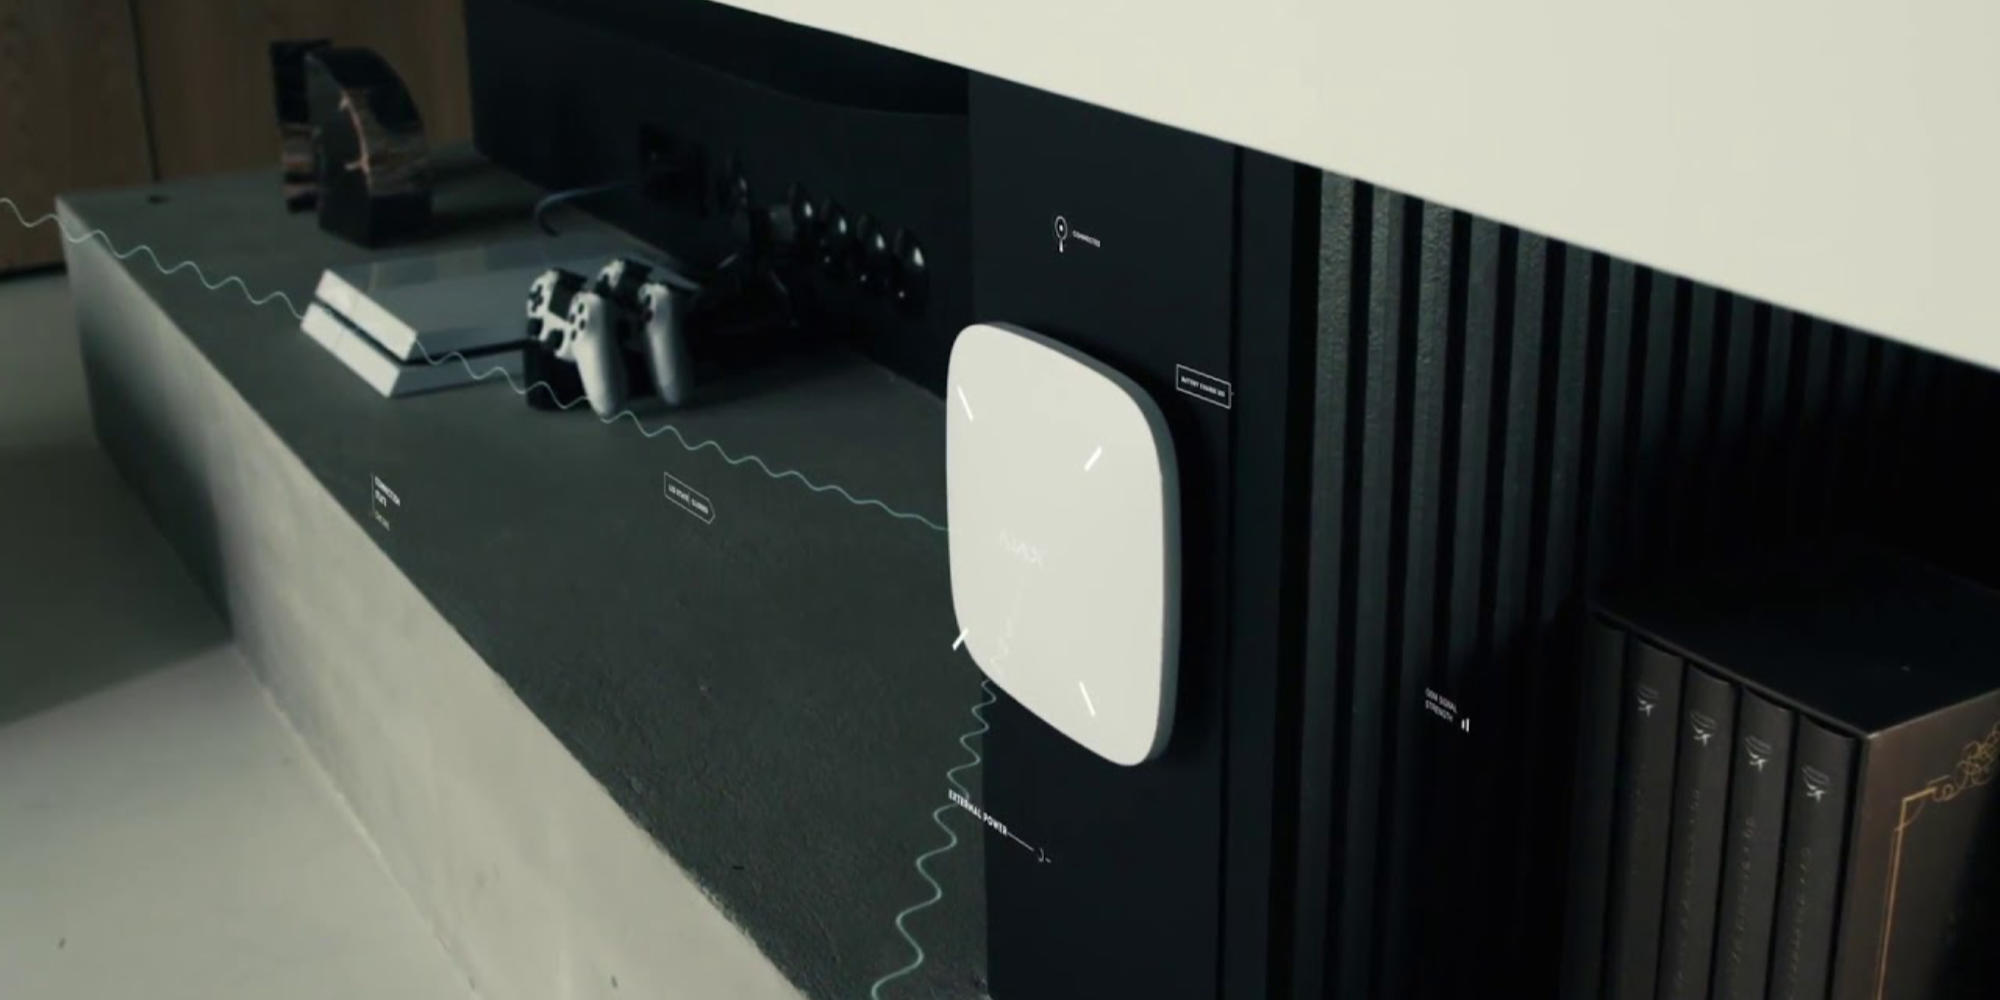 Alarme Ajax System : sytème de transmission radio sécurisé